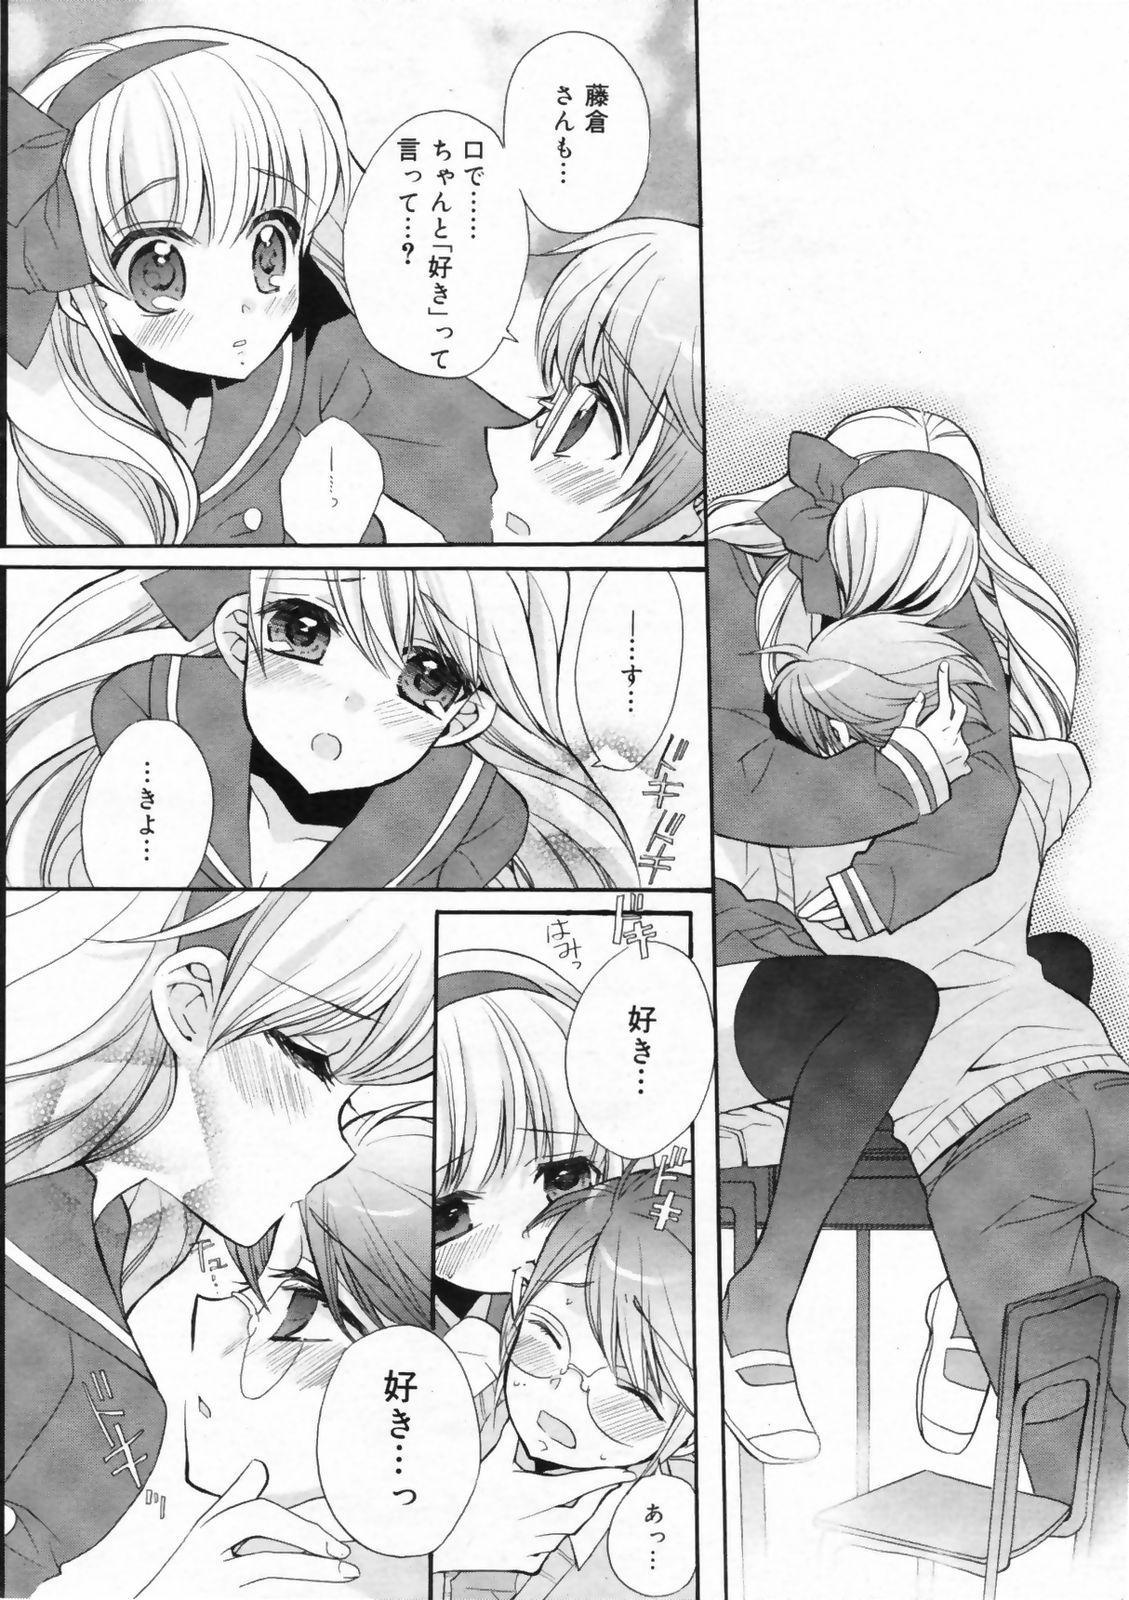 Manga Bangaichi 2009-02 Vol. 234 13